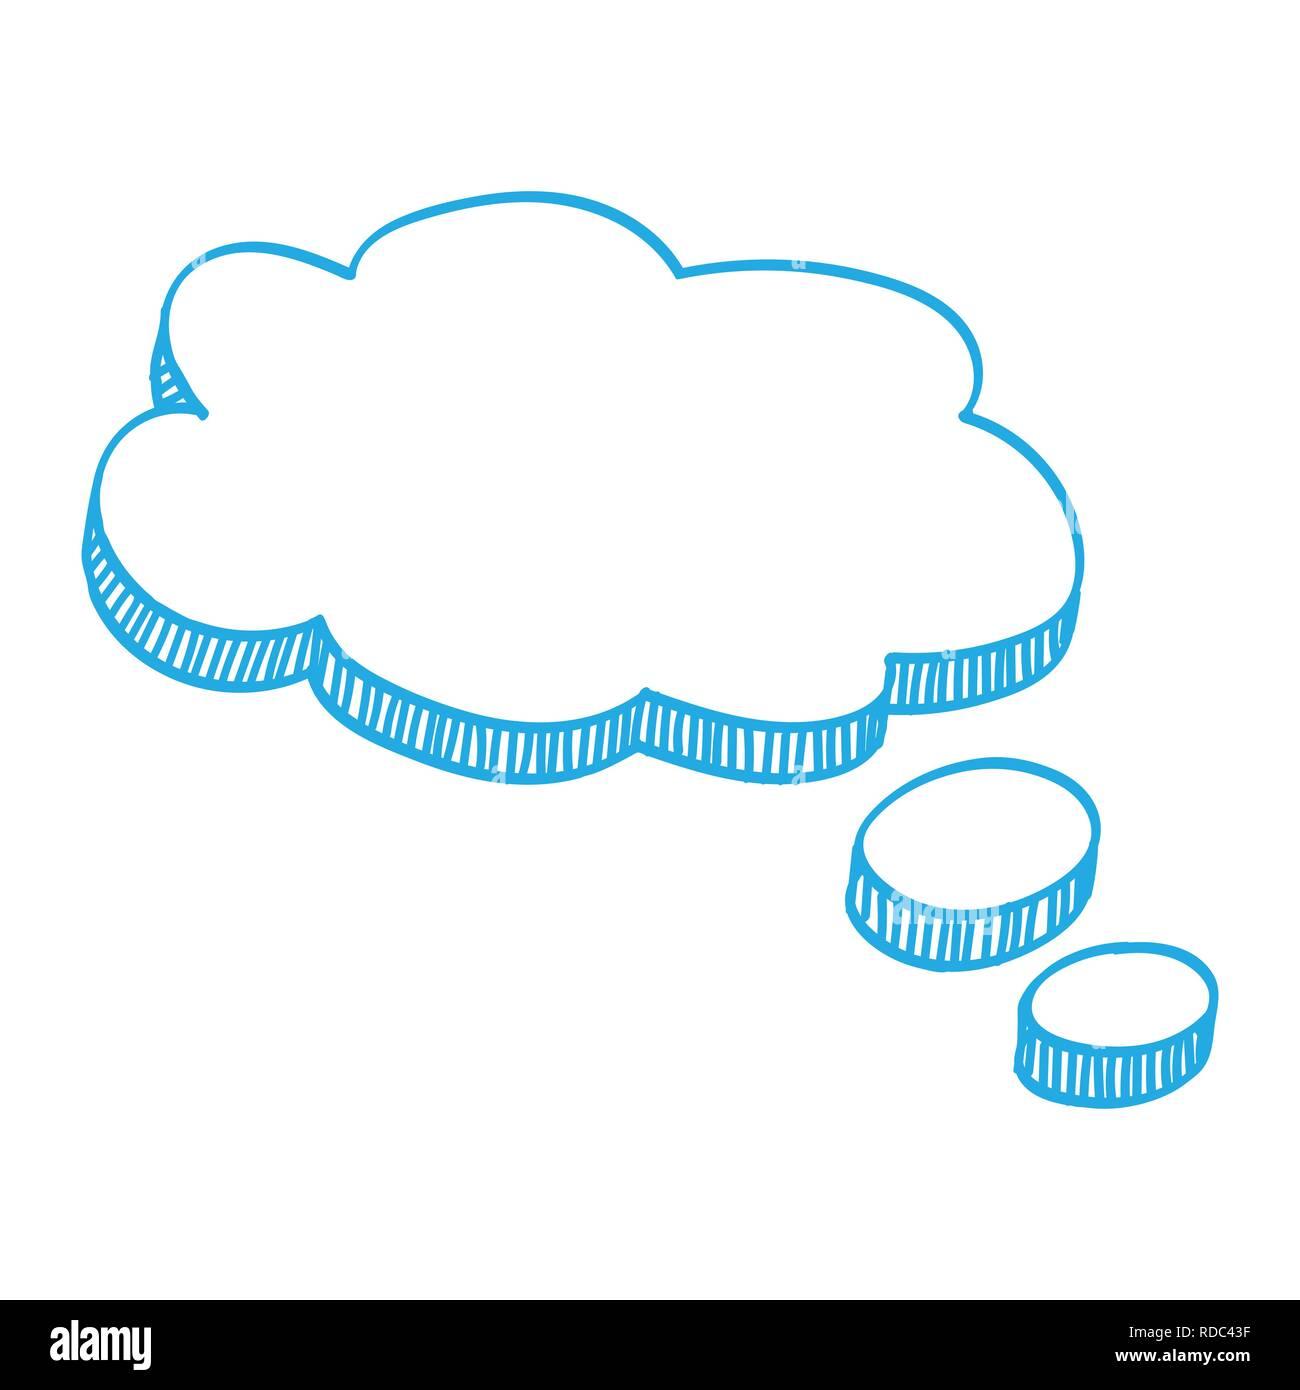 Blue speech balloon Blank template, text speech bubble with Blue ink, Vector Illustration - Stock Image